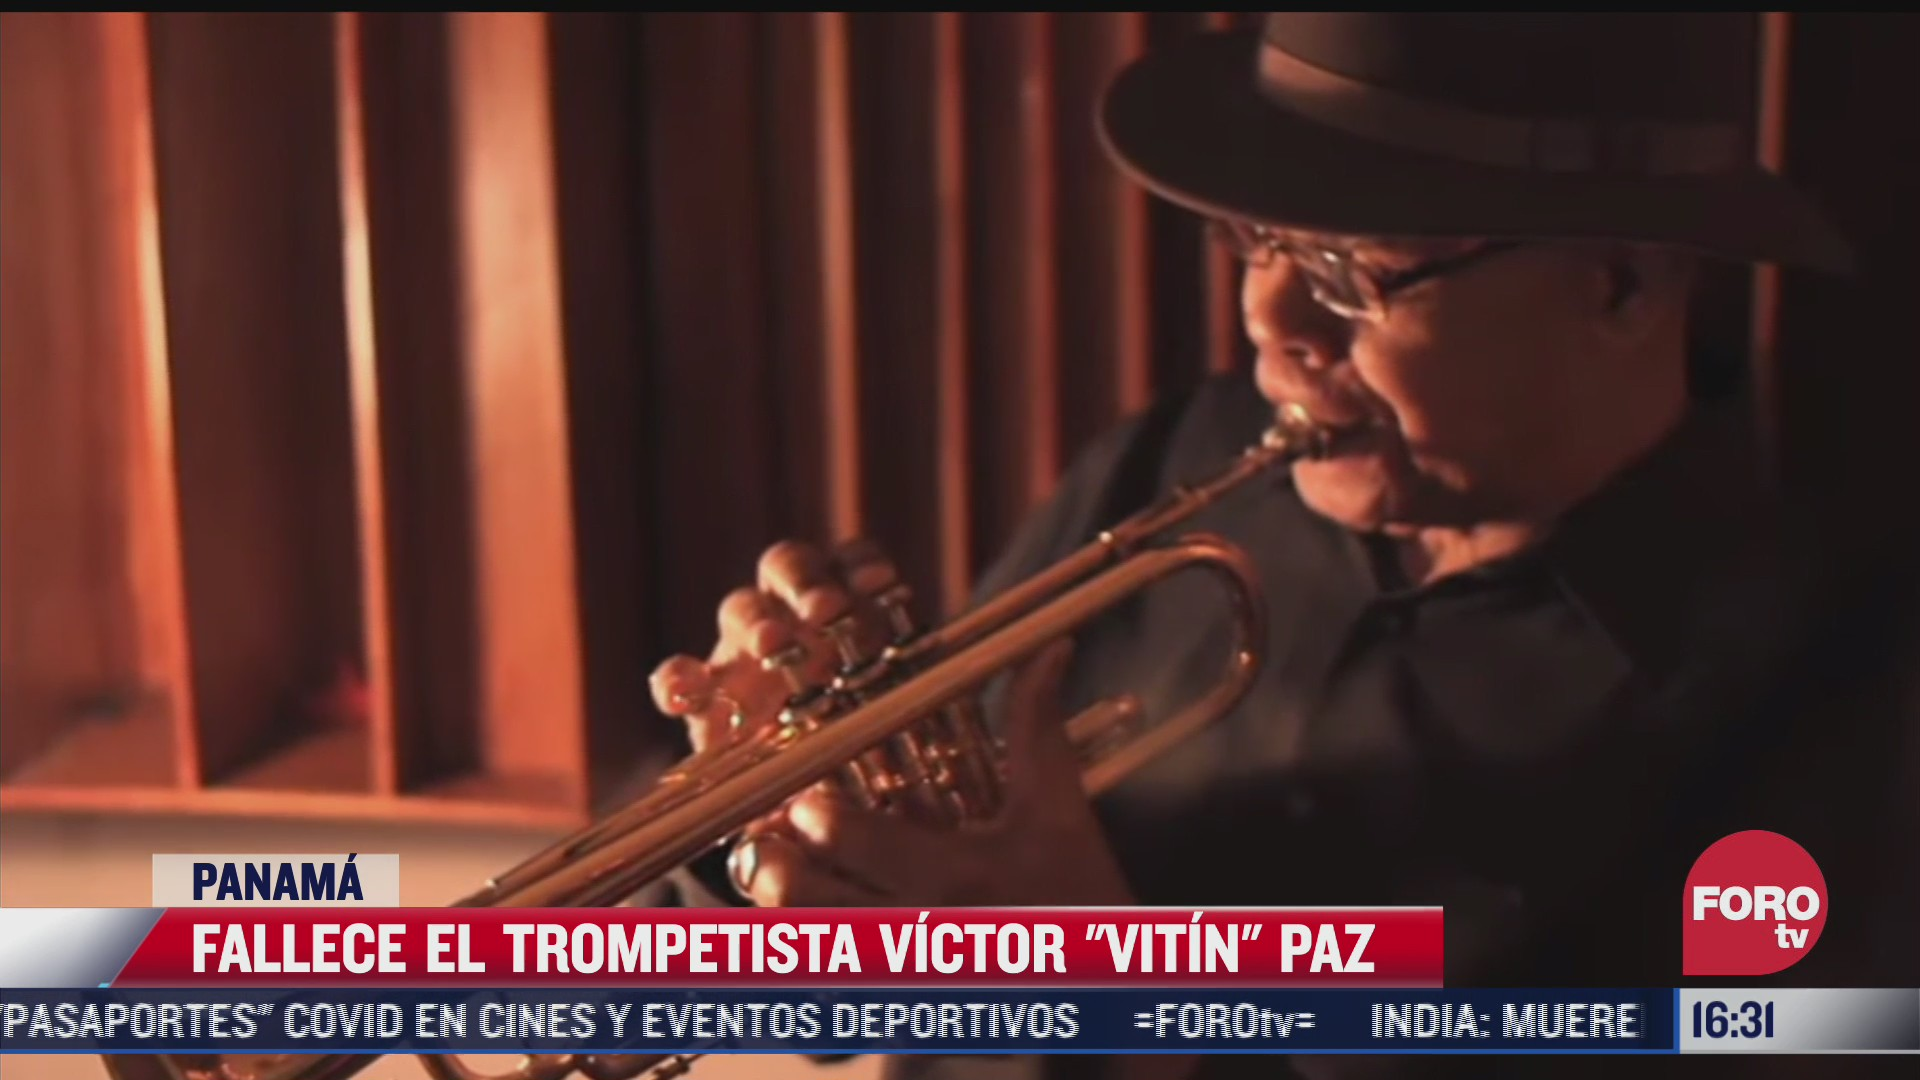 muere el trompetista vitin paz leyenda de la musica panamena